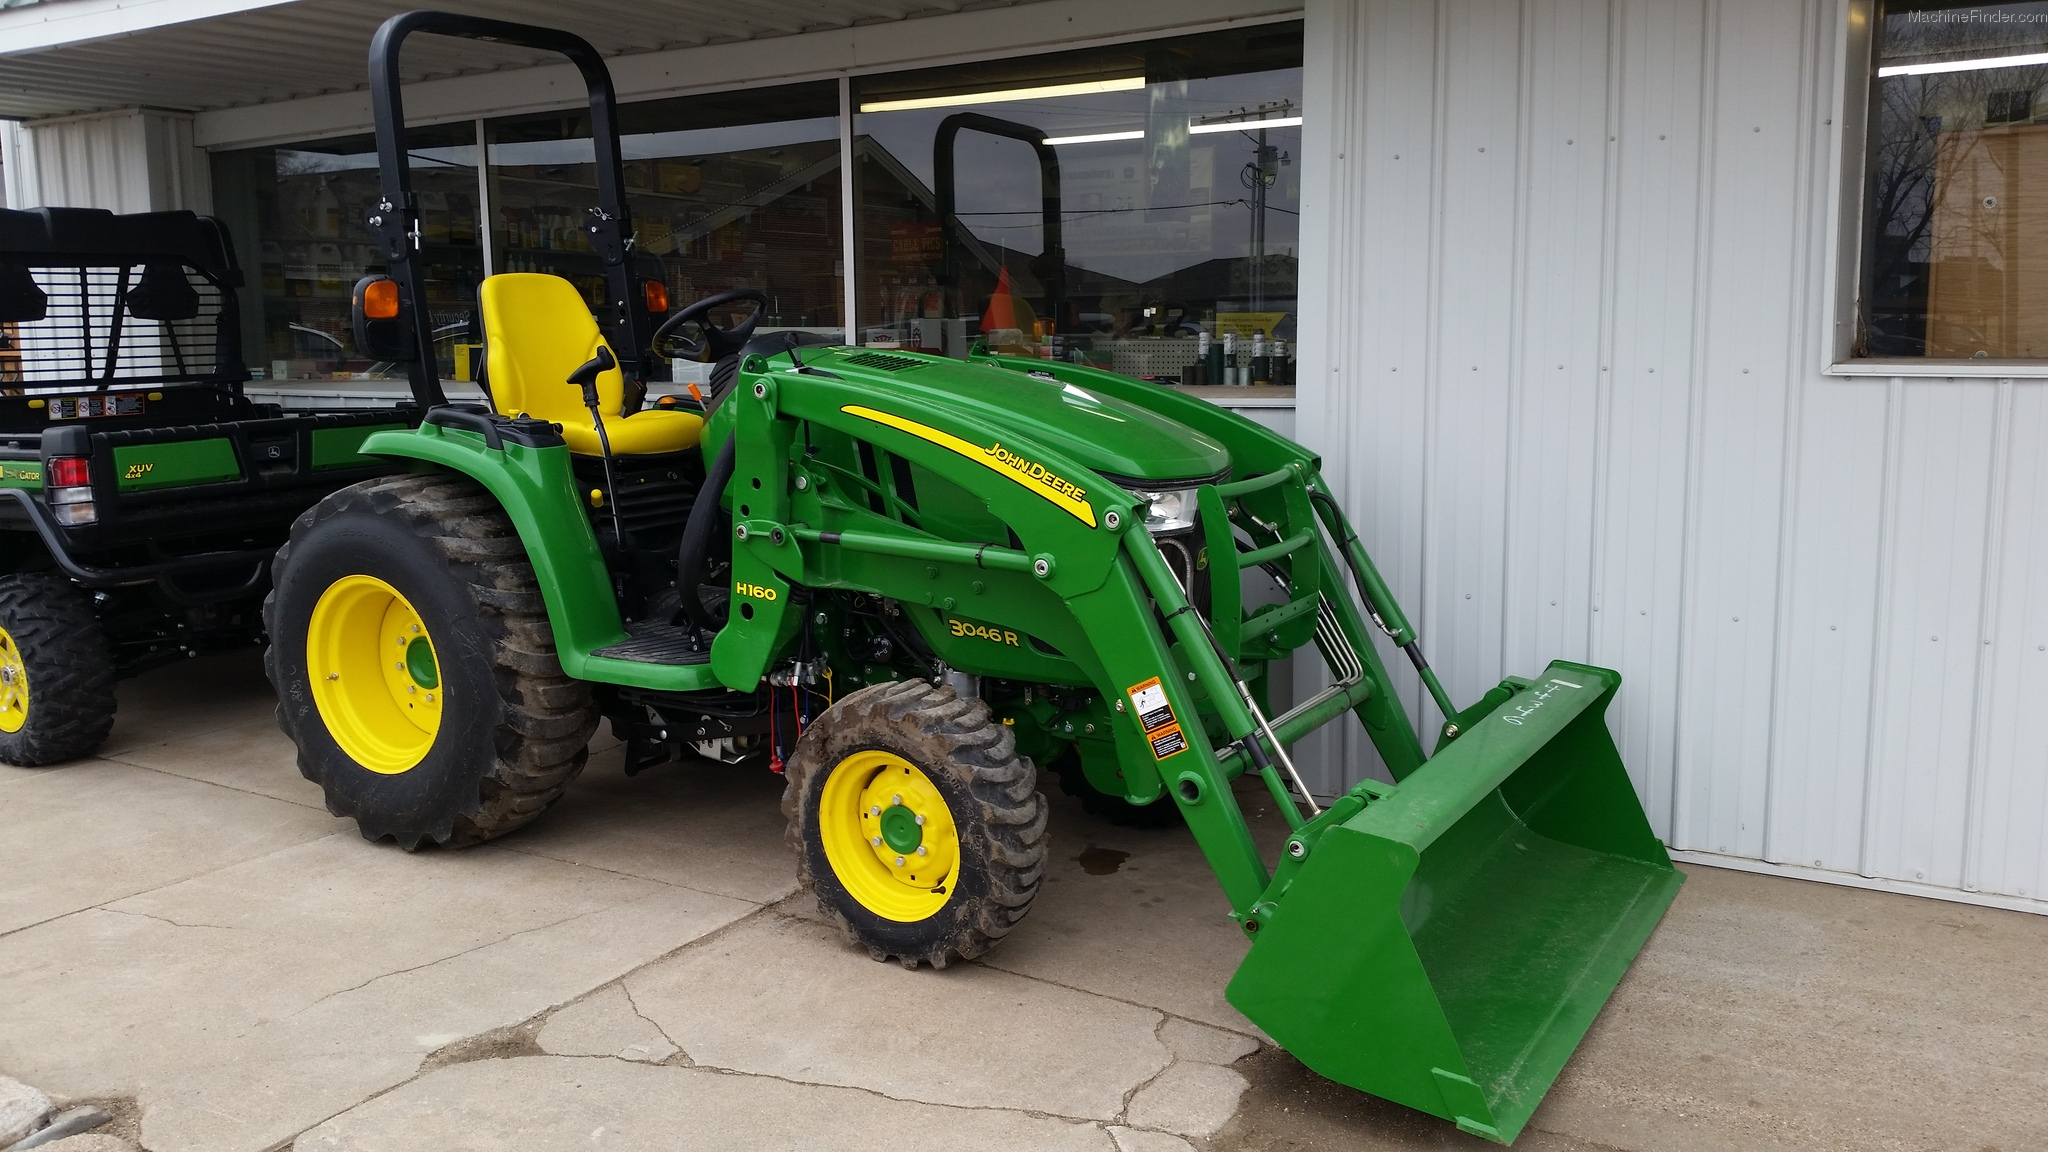 2014 John Deere 3046R Tractors - Compact (1-40hp.) - John ...